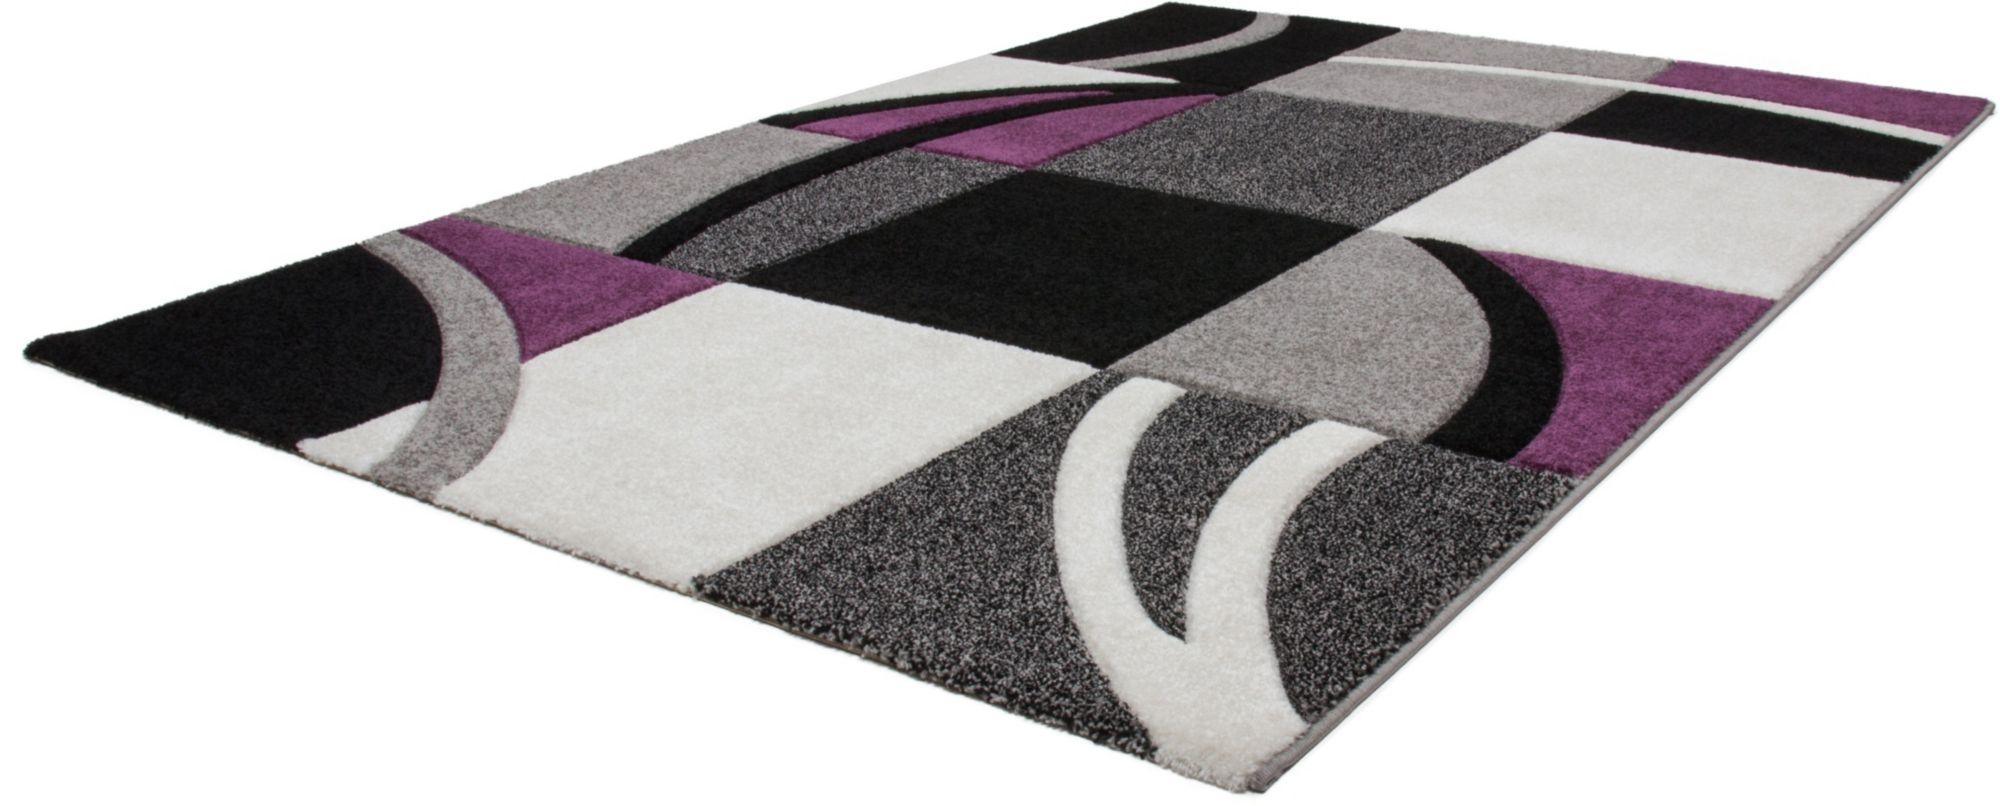 Teppich, »Havanna 421«, Lalee, rechteckig, Höhe 15 mm, maschinell gewebt